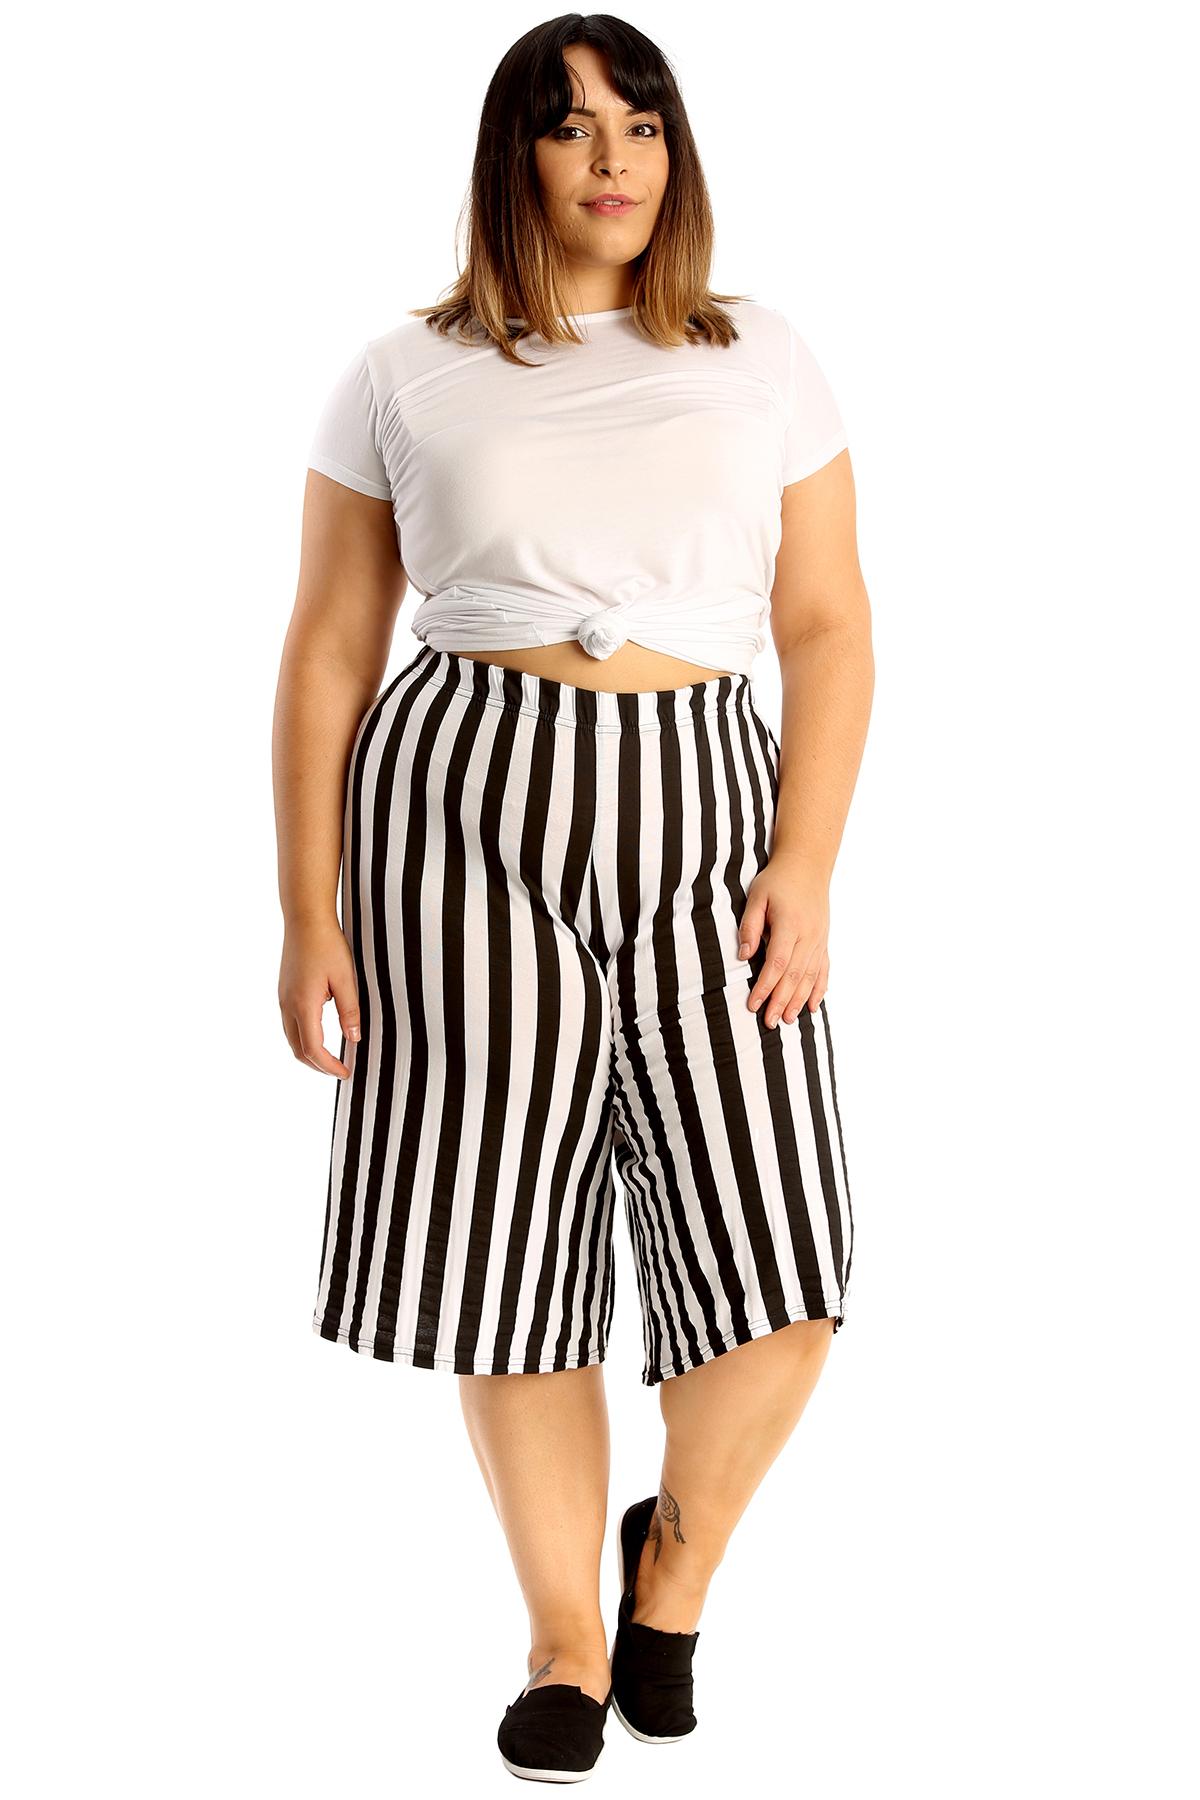 New Womens Plus Size Culottes Ladies Stripe Print Shorts Elastic Waist Wide Leg